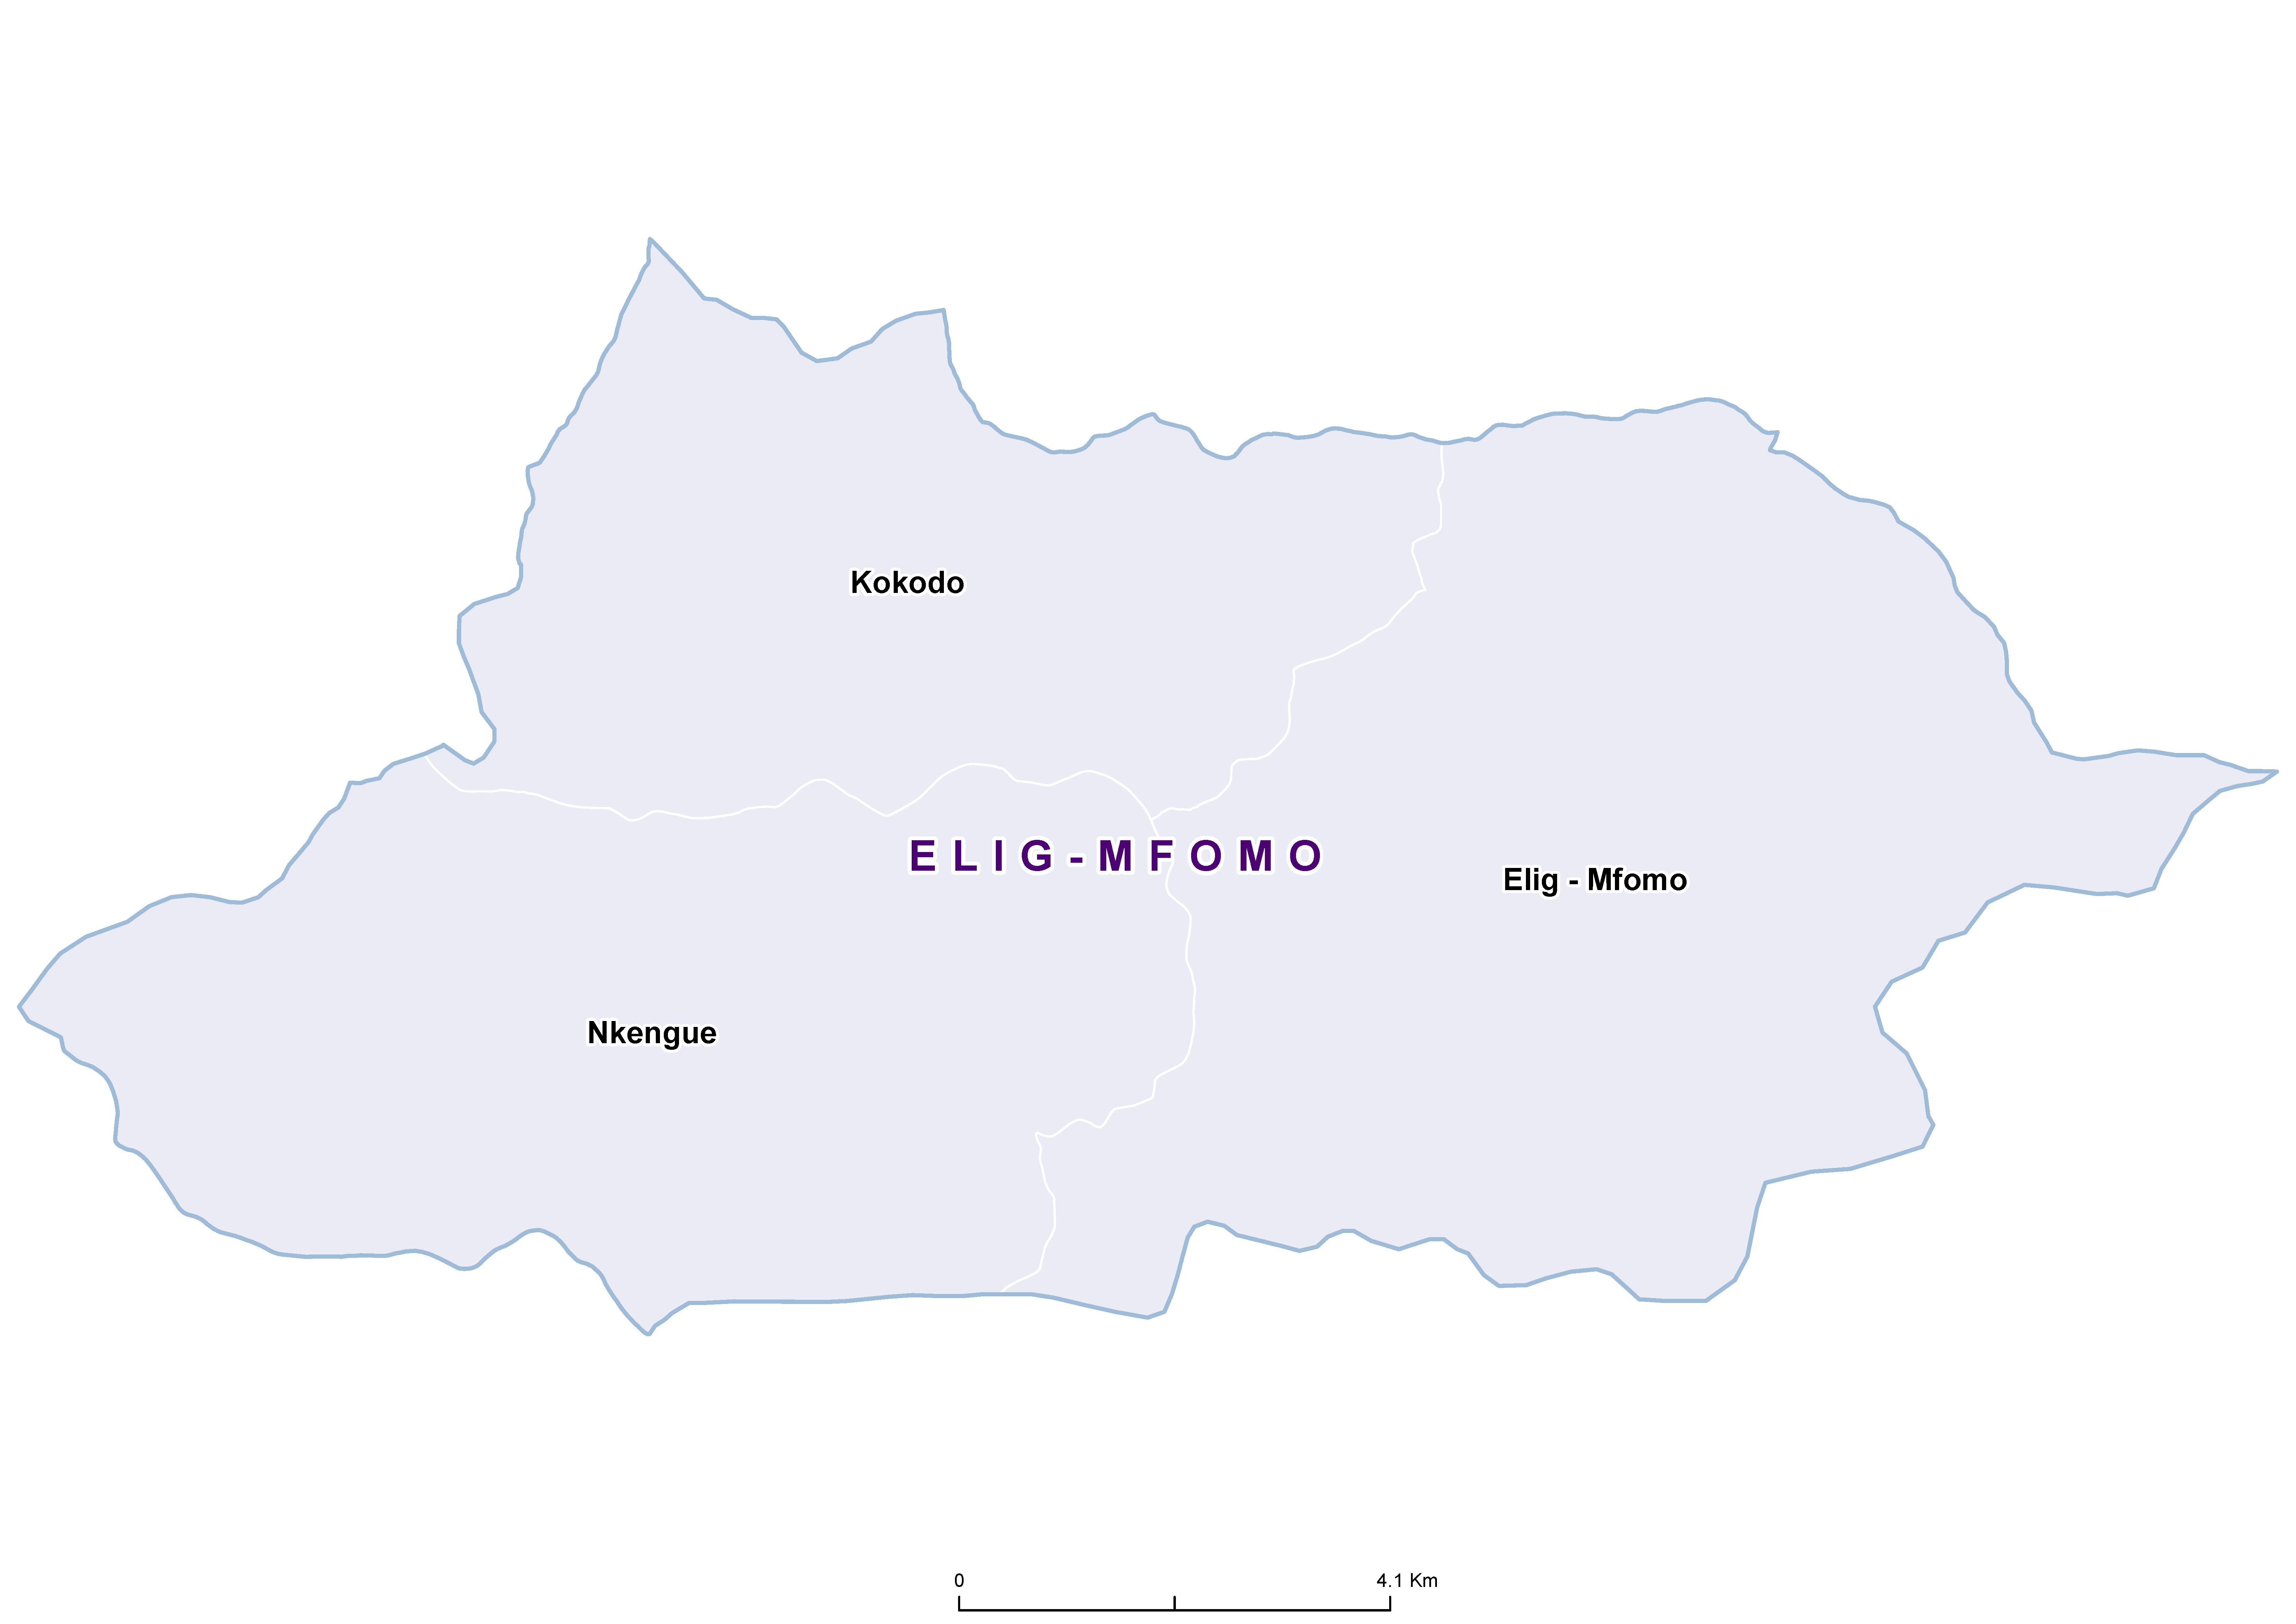 Elig-mfomo STH 20180001